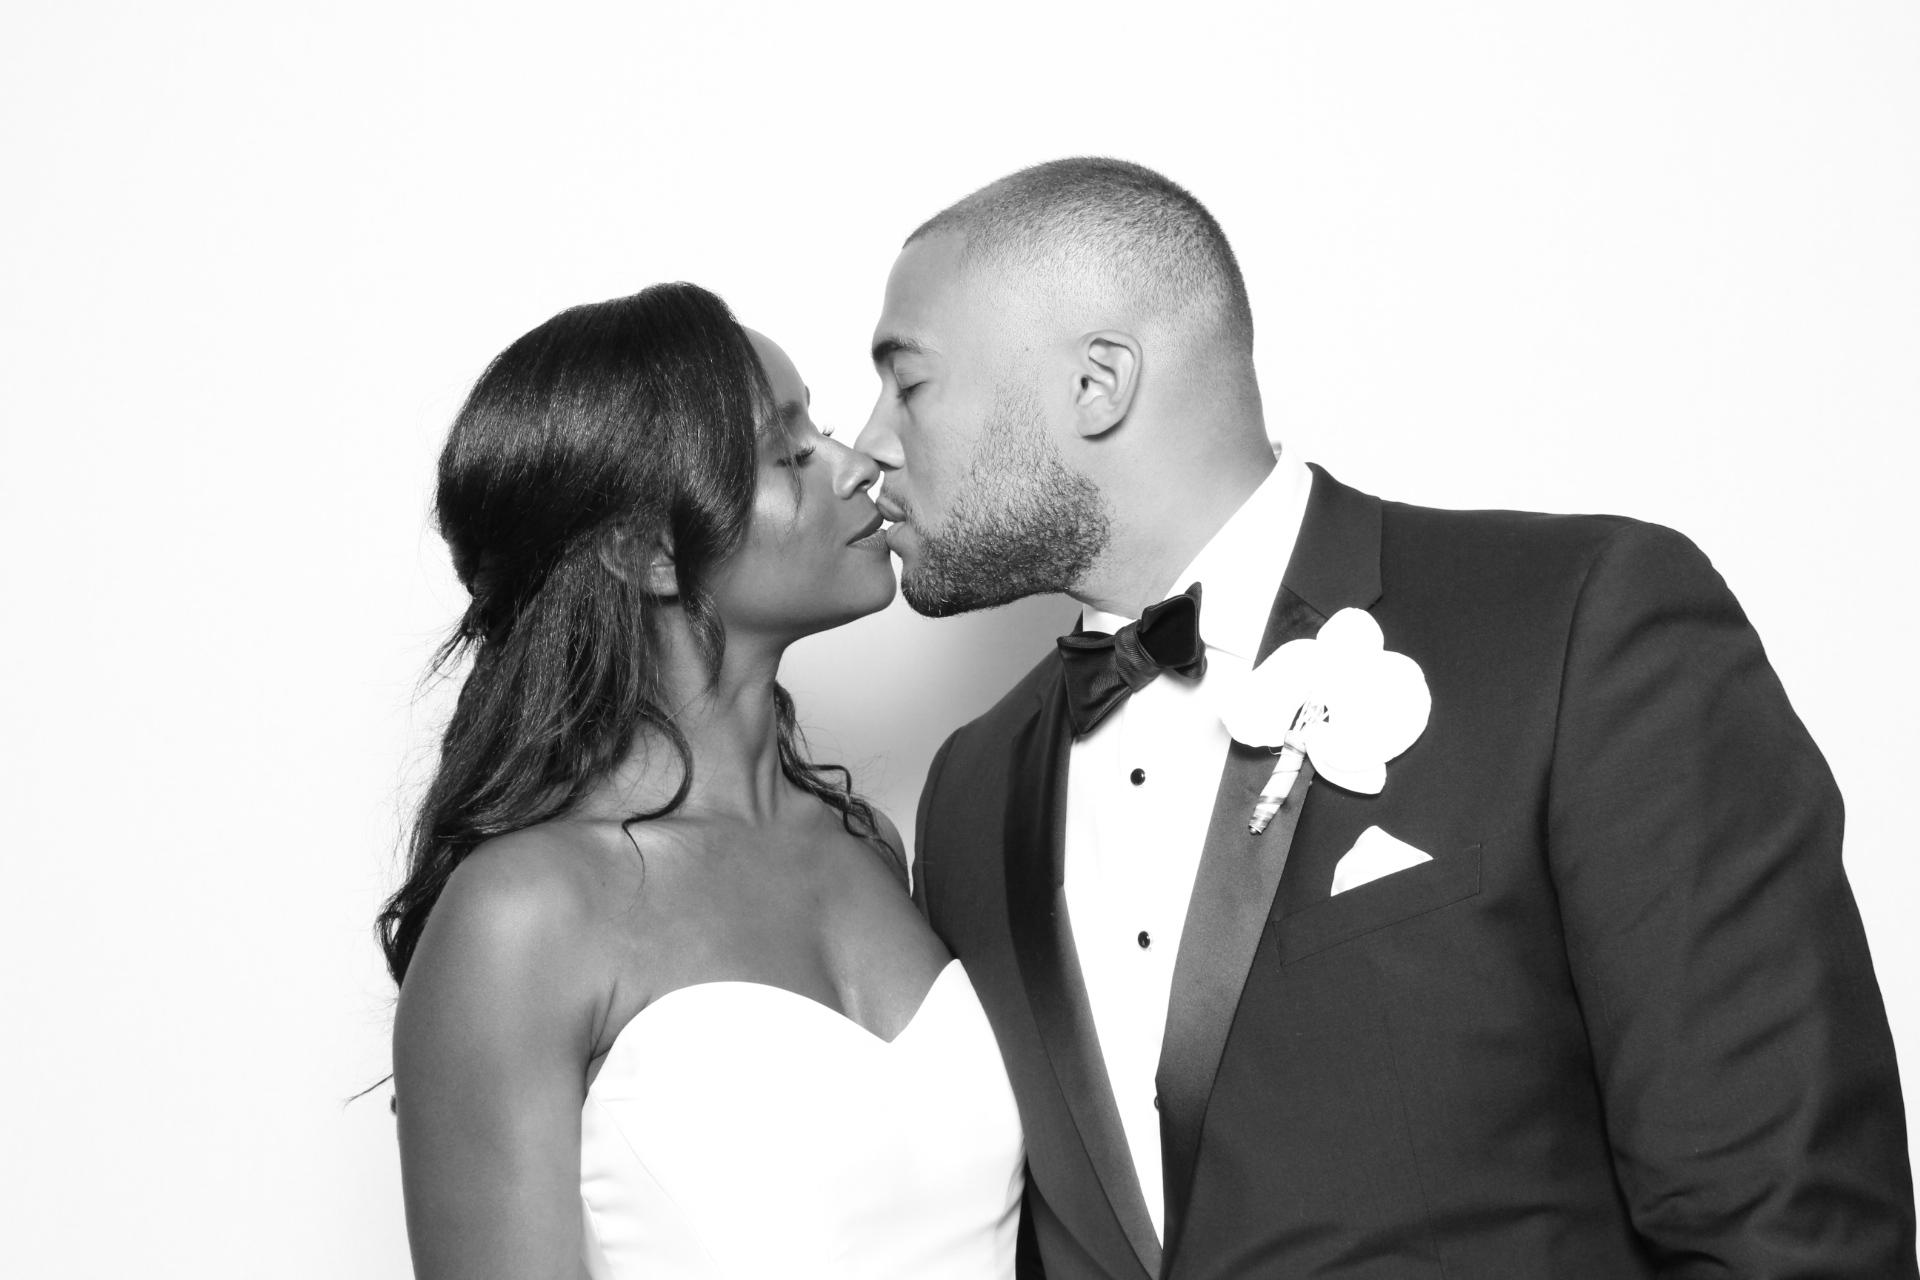 ALEX + PETE WEDDING | HOT PINK PHOTO BOOTH